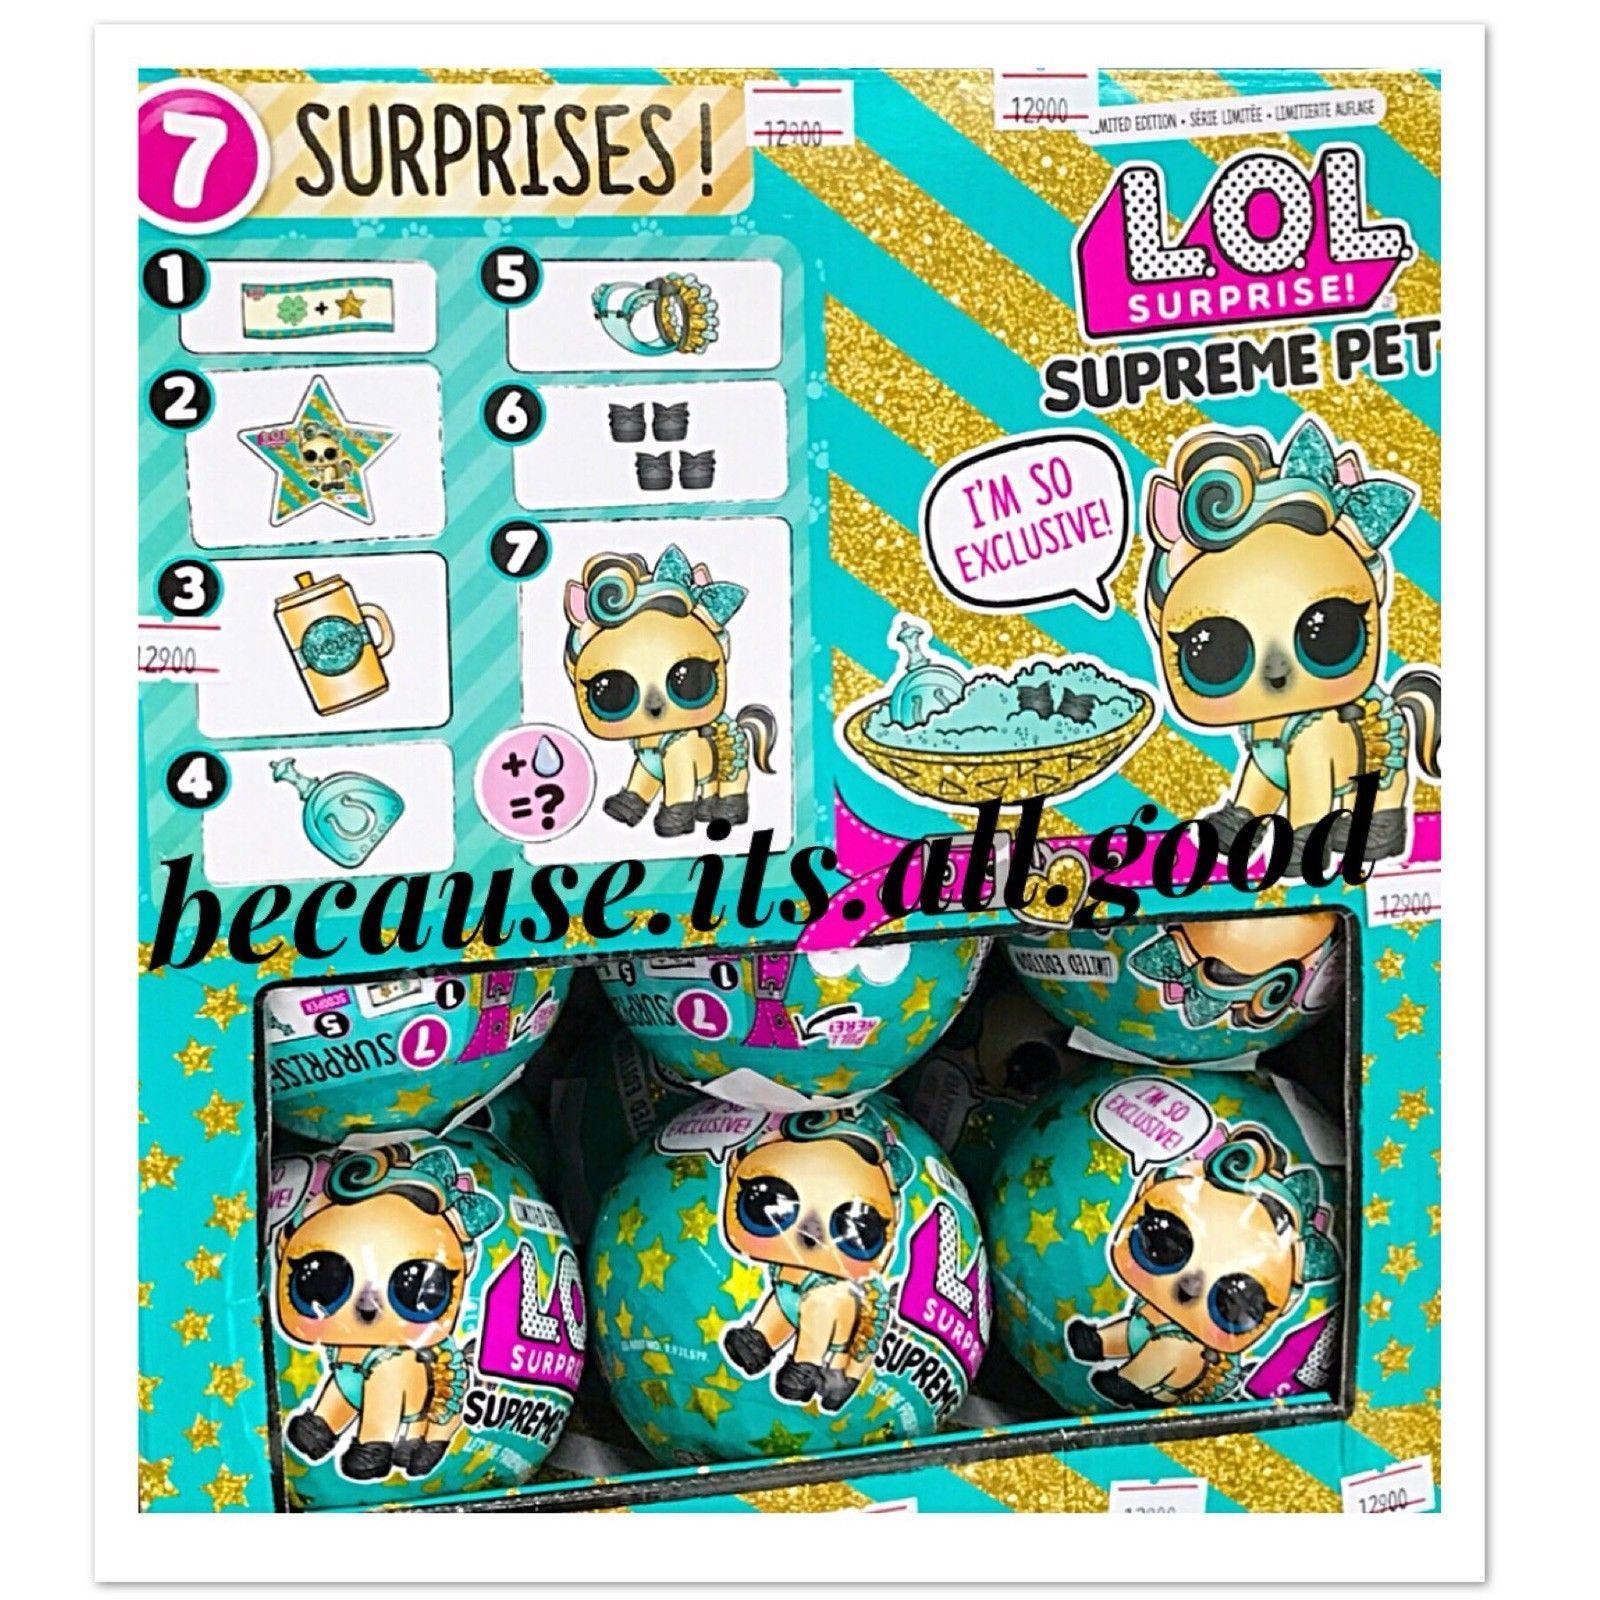 1 Lol Surprise Limited Edition Supreme